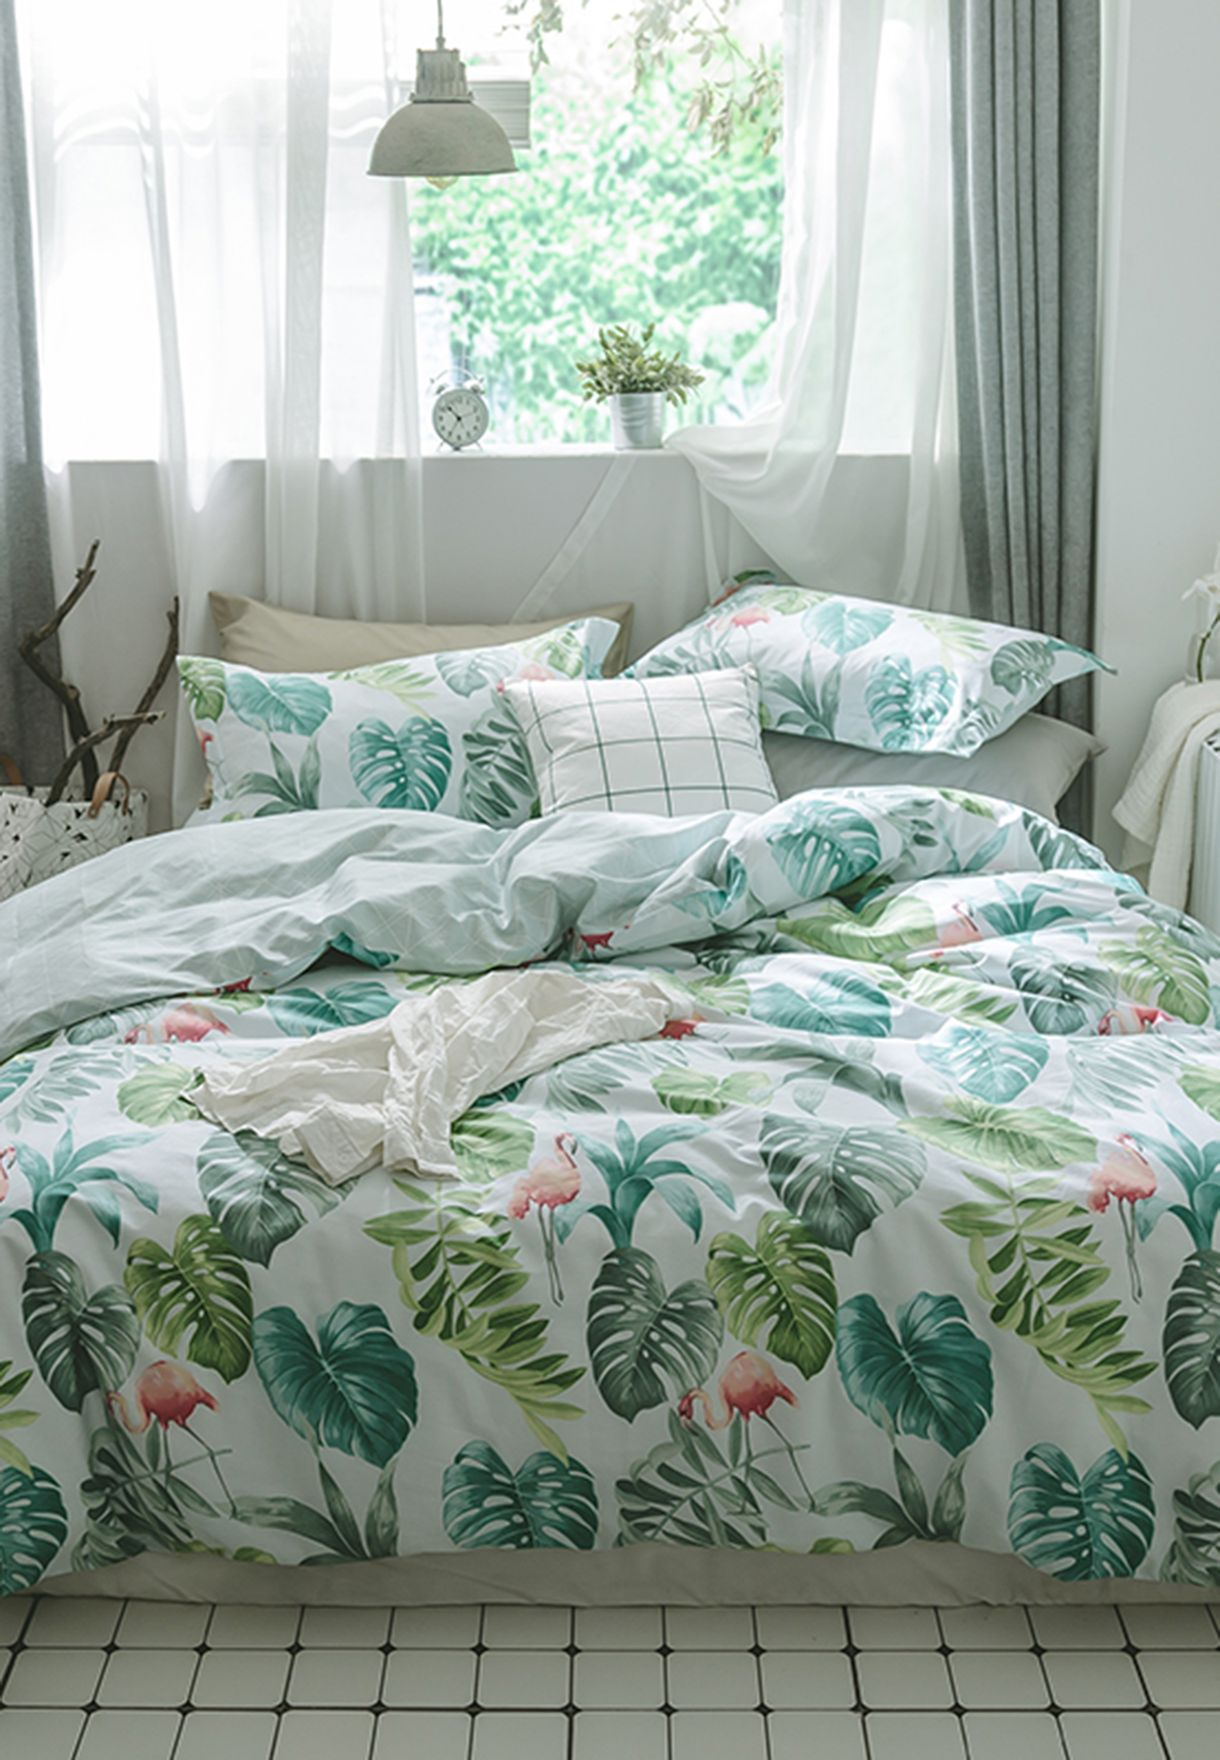 Tropical Print Bedding Set - King 200 x 230cm